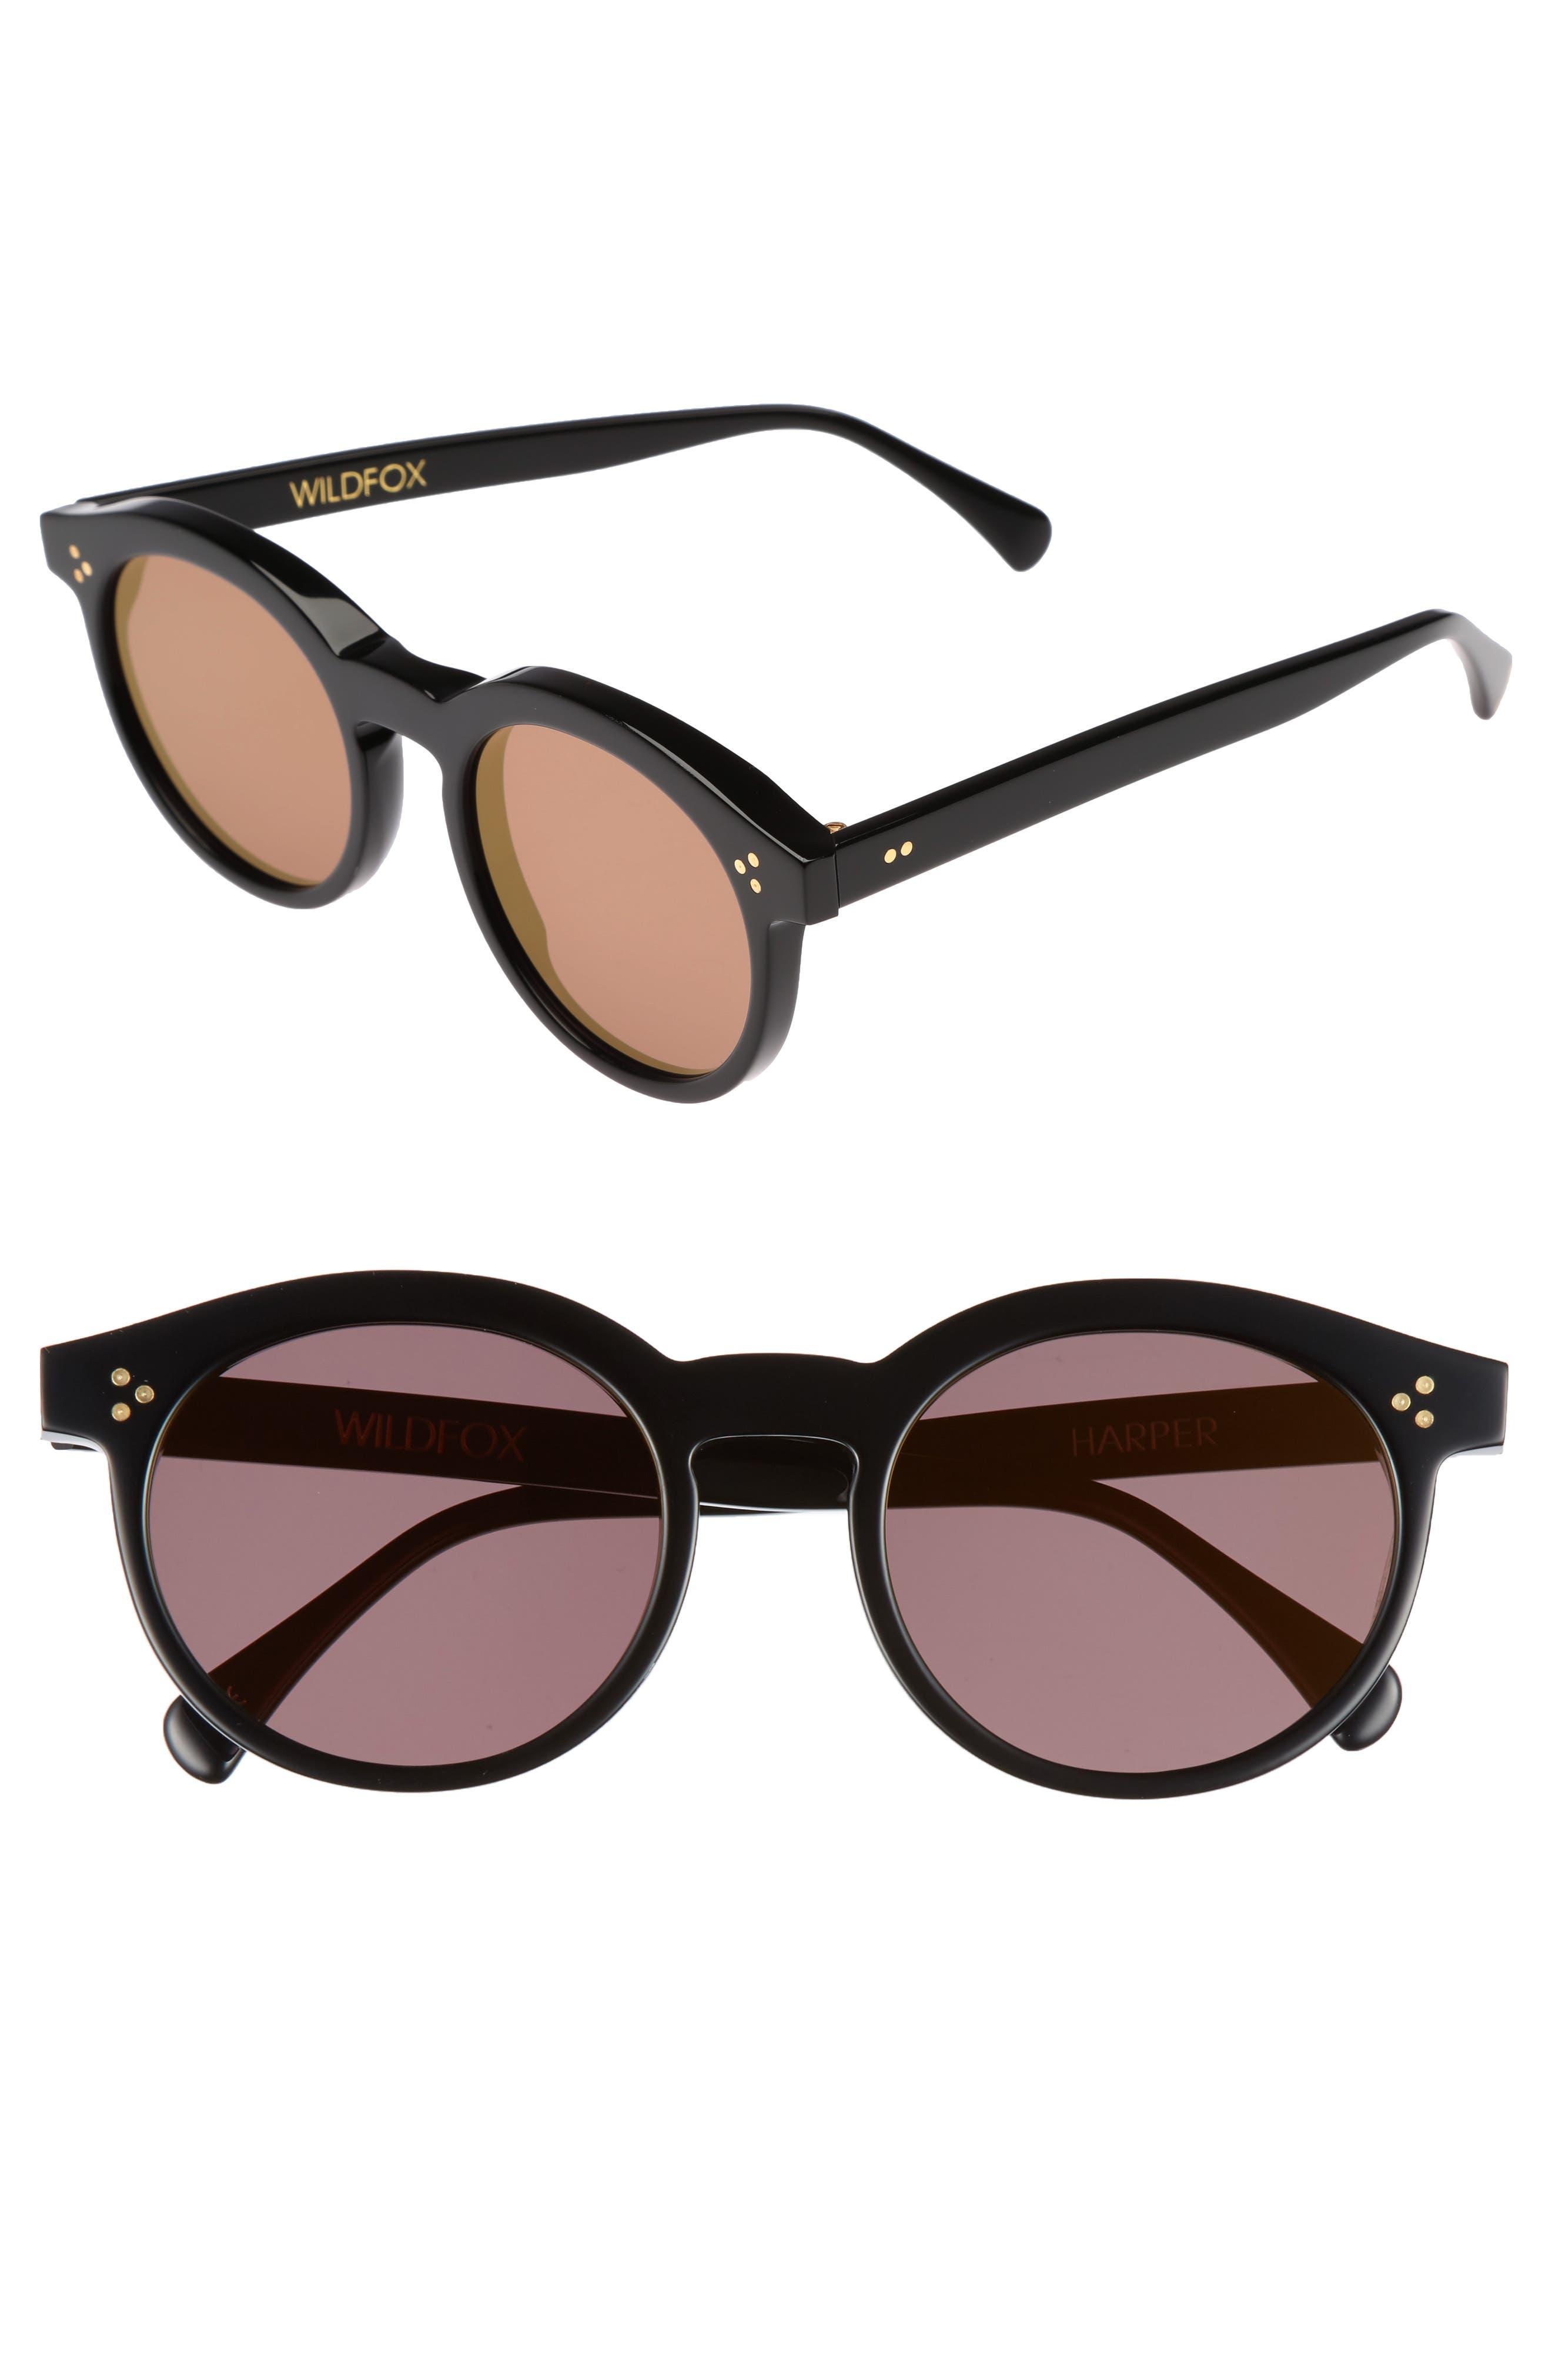 Harper Zero 53mm Round Keyhole Sunglasses,                             Main thumbnail 1, color,                             Black/ Gold